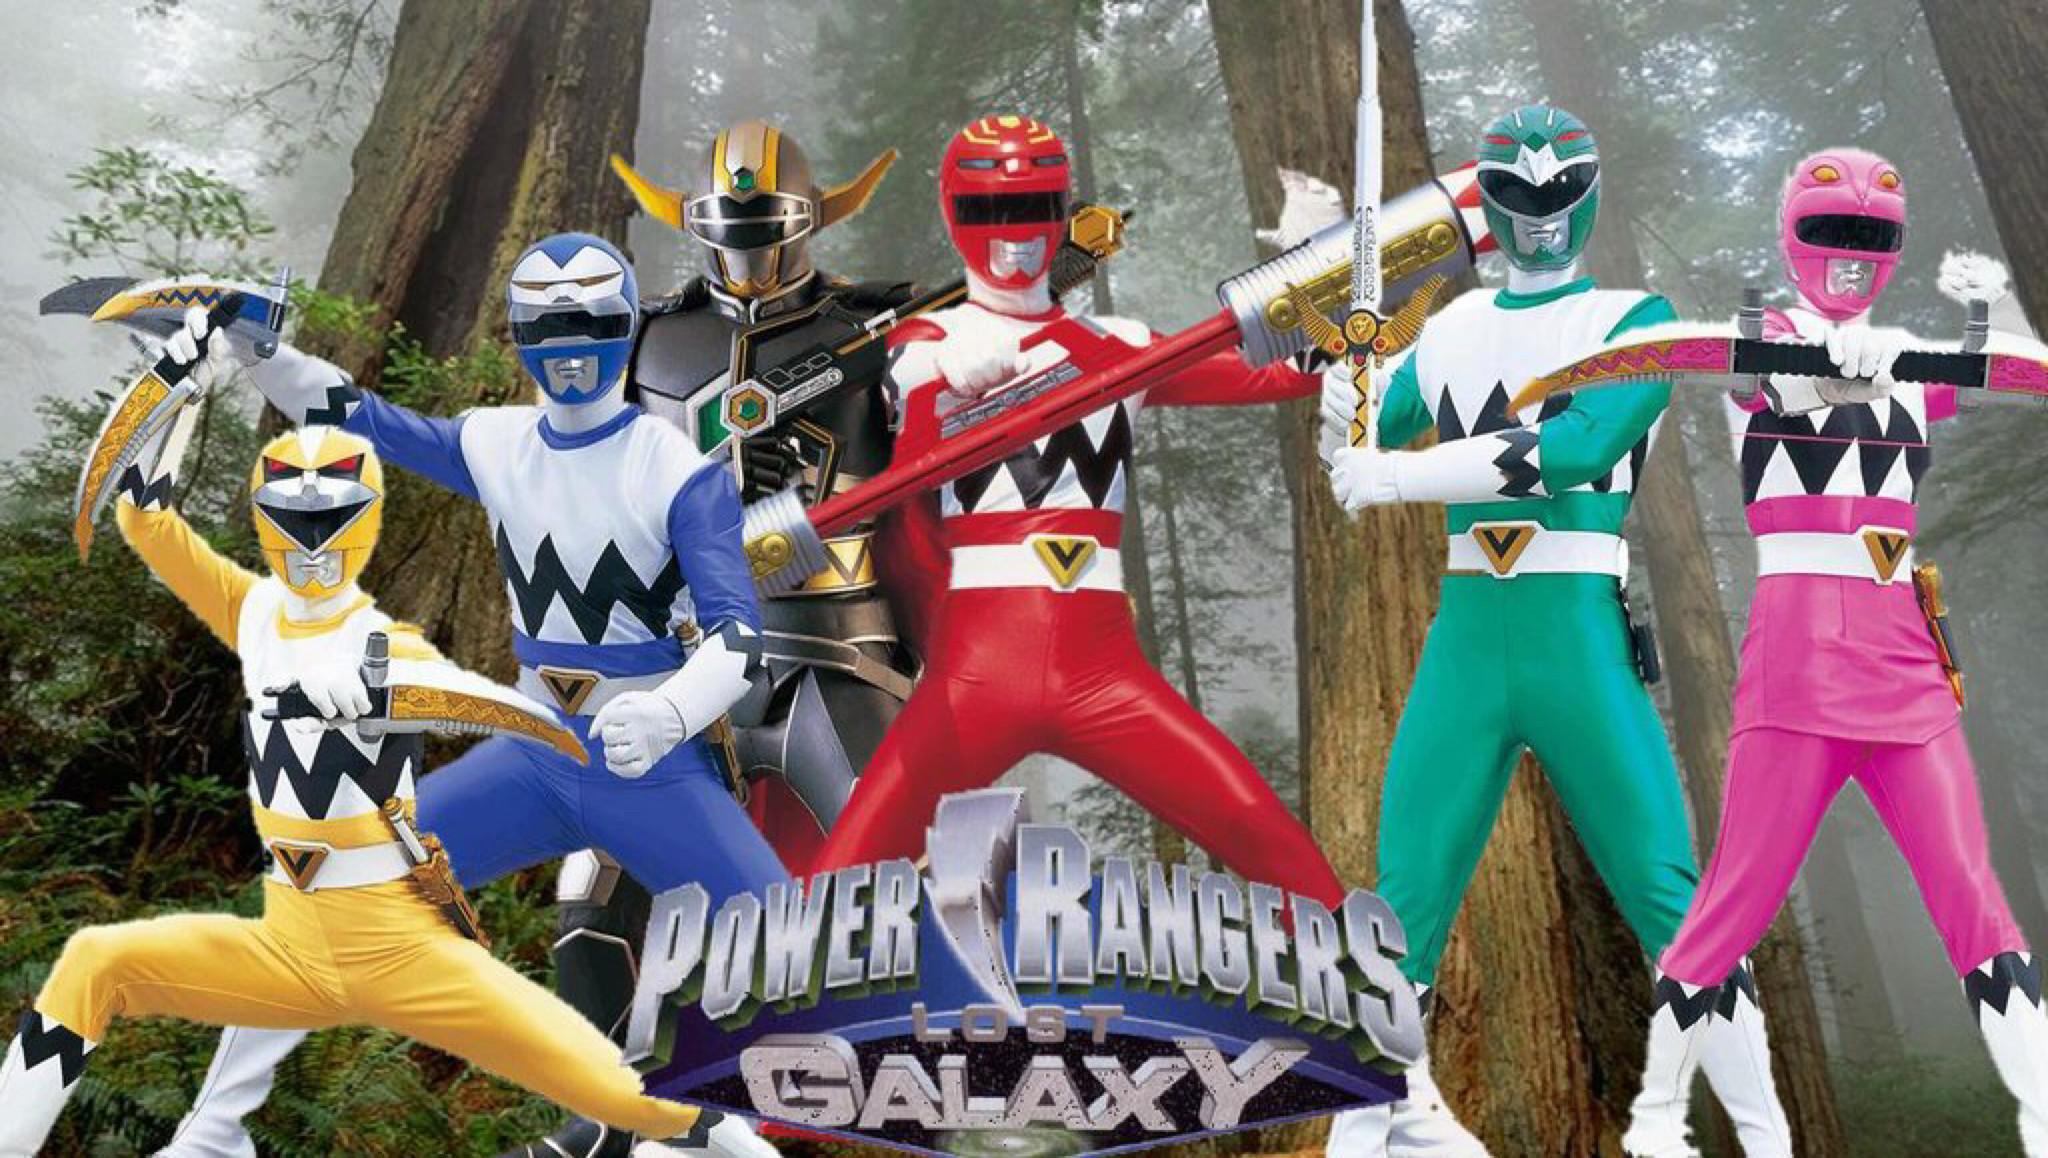 Power Rangers Jungle Fury Wallpaper (64+ images)